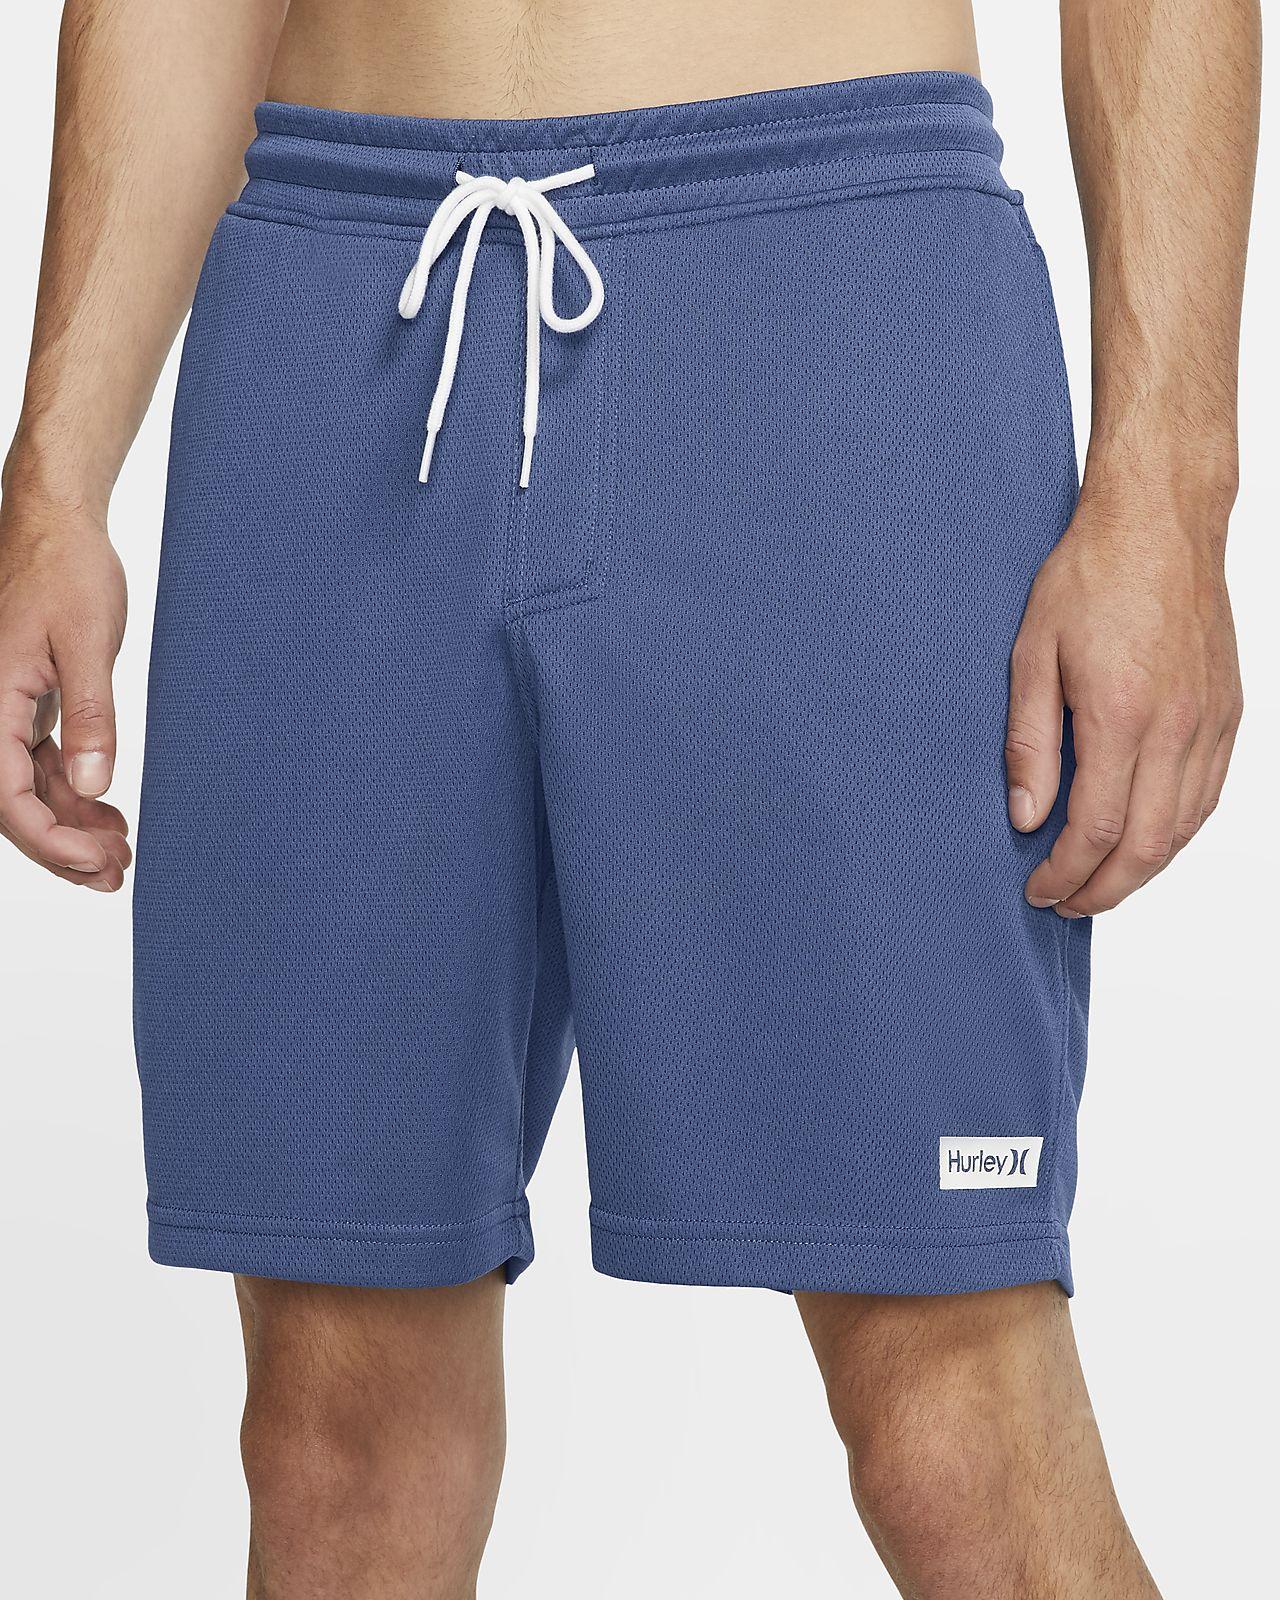 "Hurley Dri-Fit Ravine Men's 19"" Shorts"